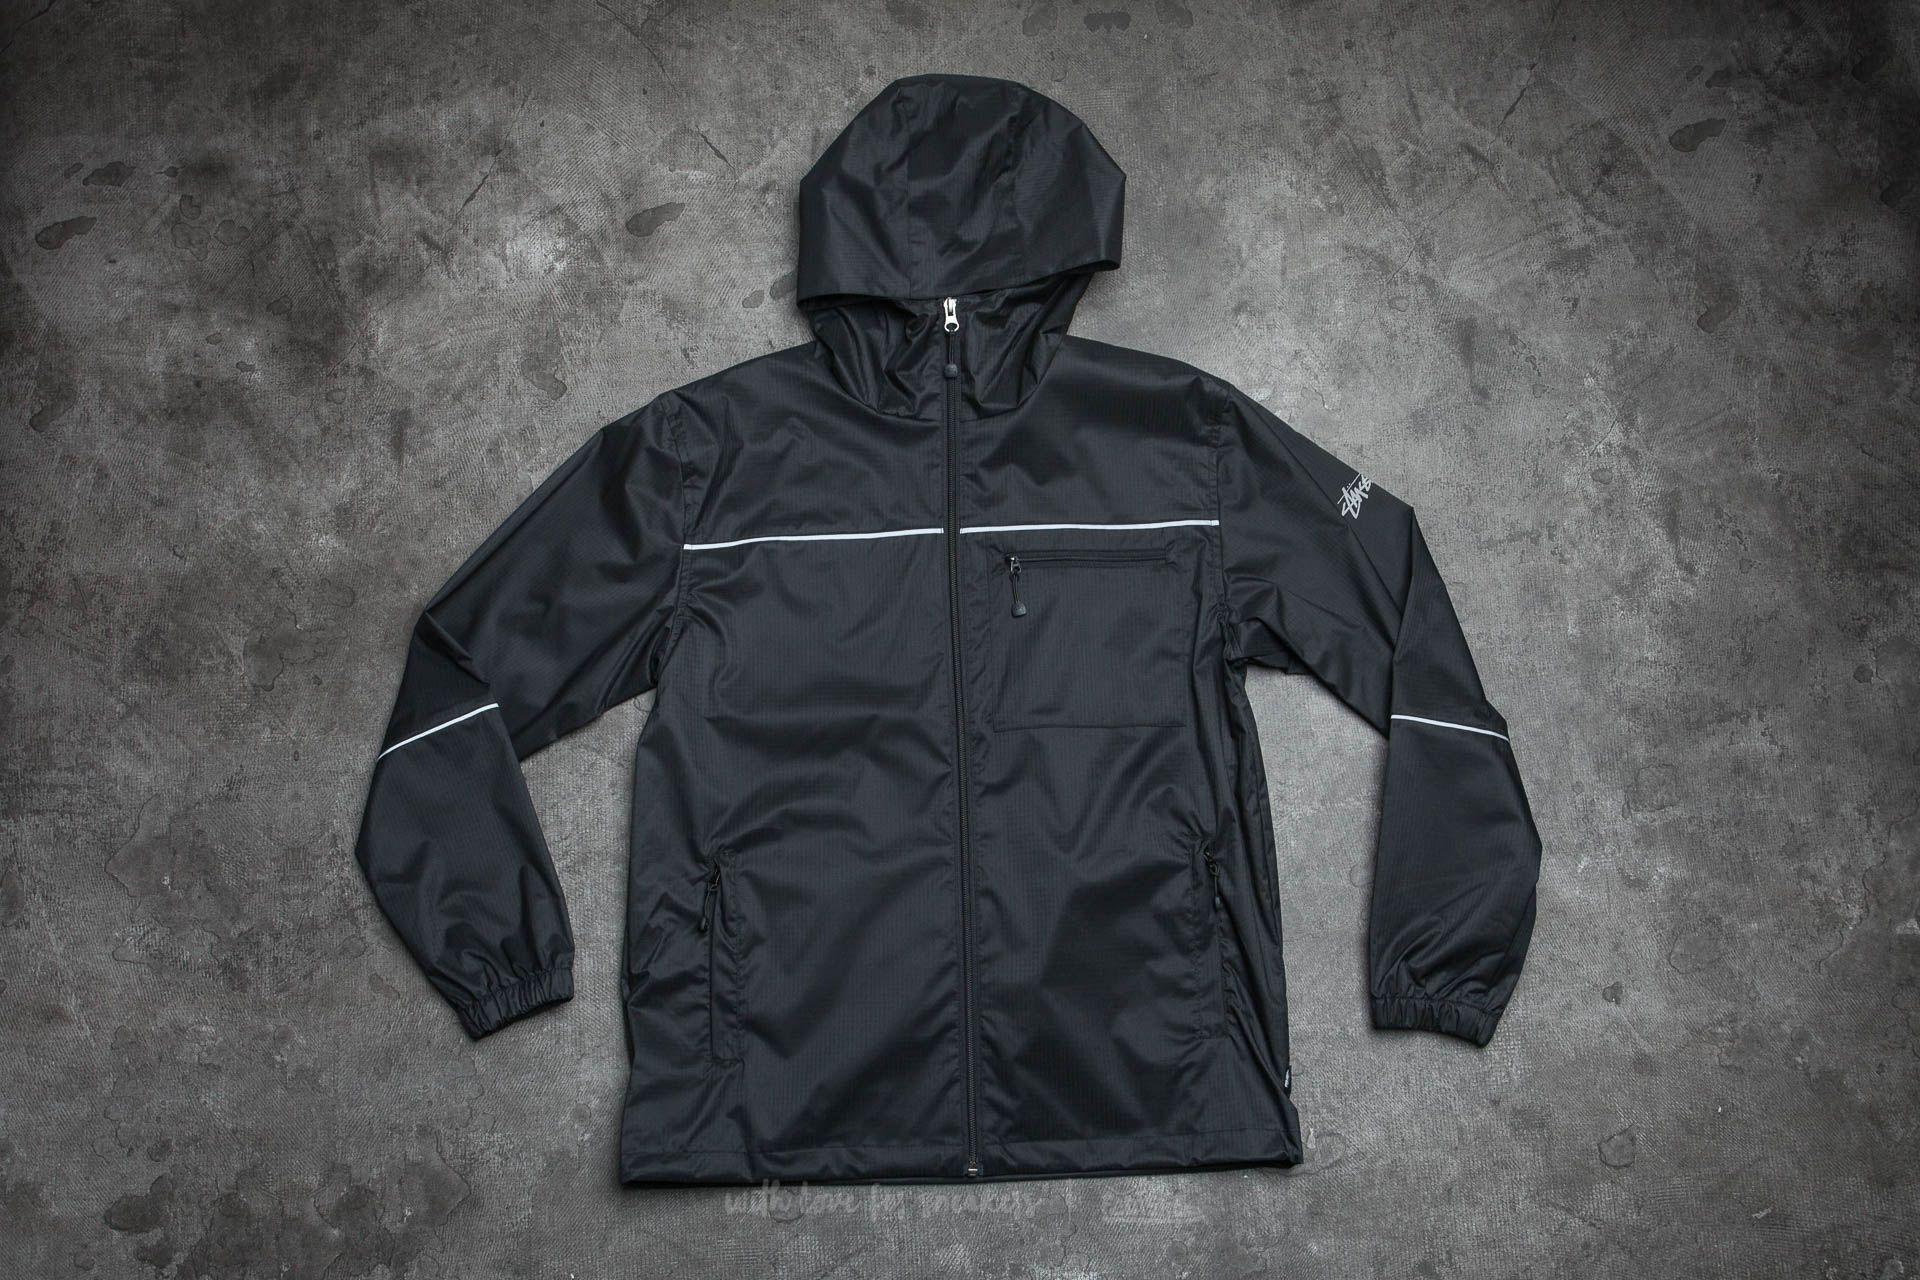 1aef5c484f03 Stüssy 3M Ripstop Jacket Black | Footshop